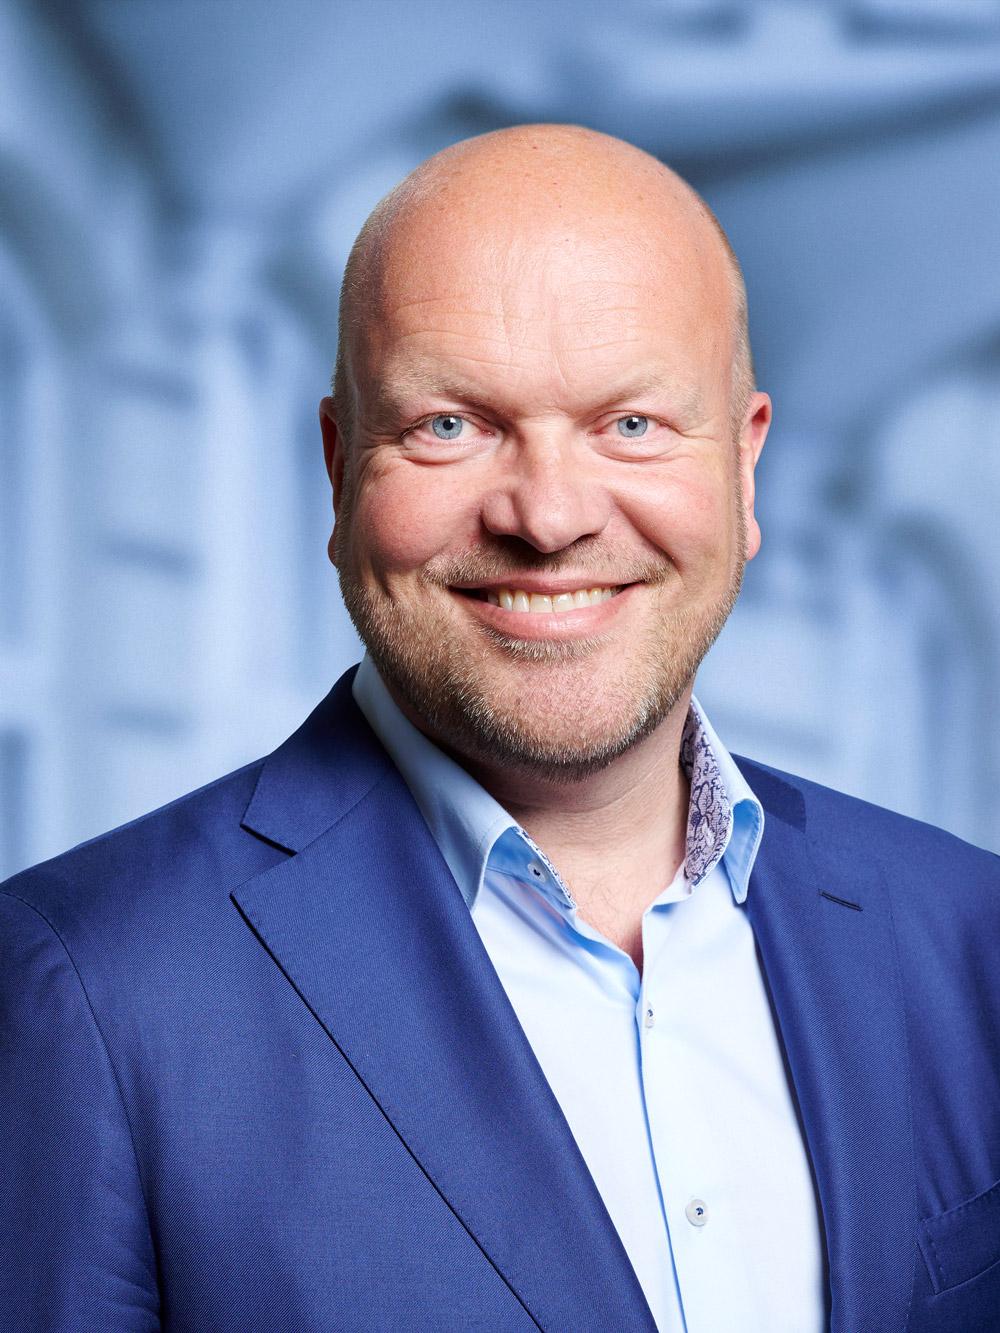 Venstre Finn Pedersen